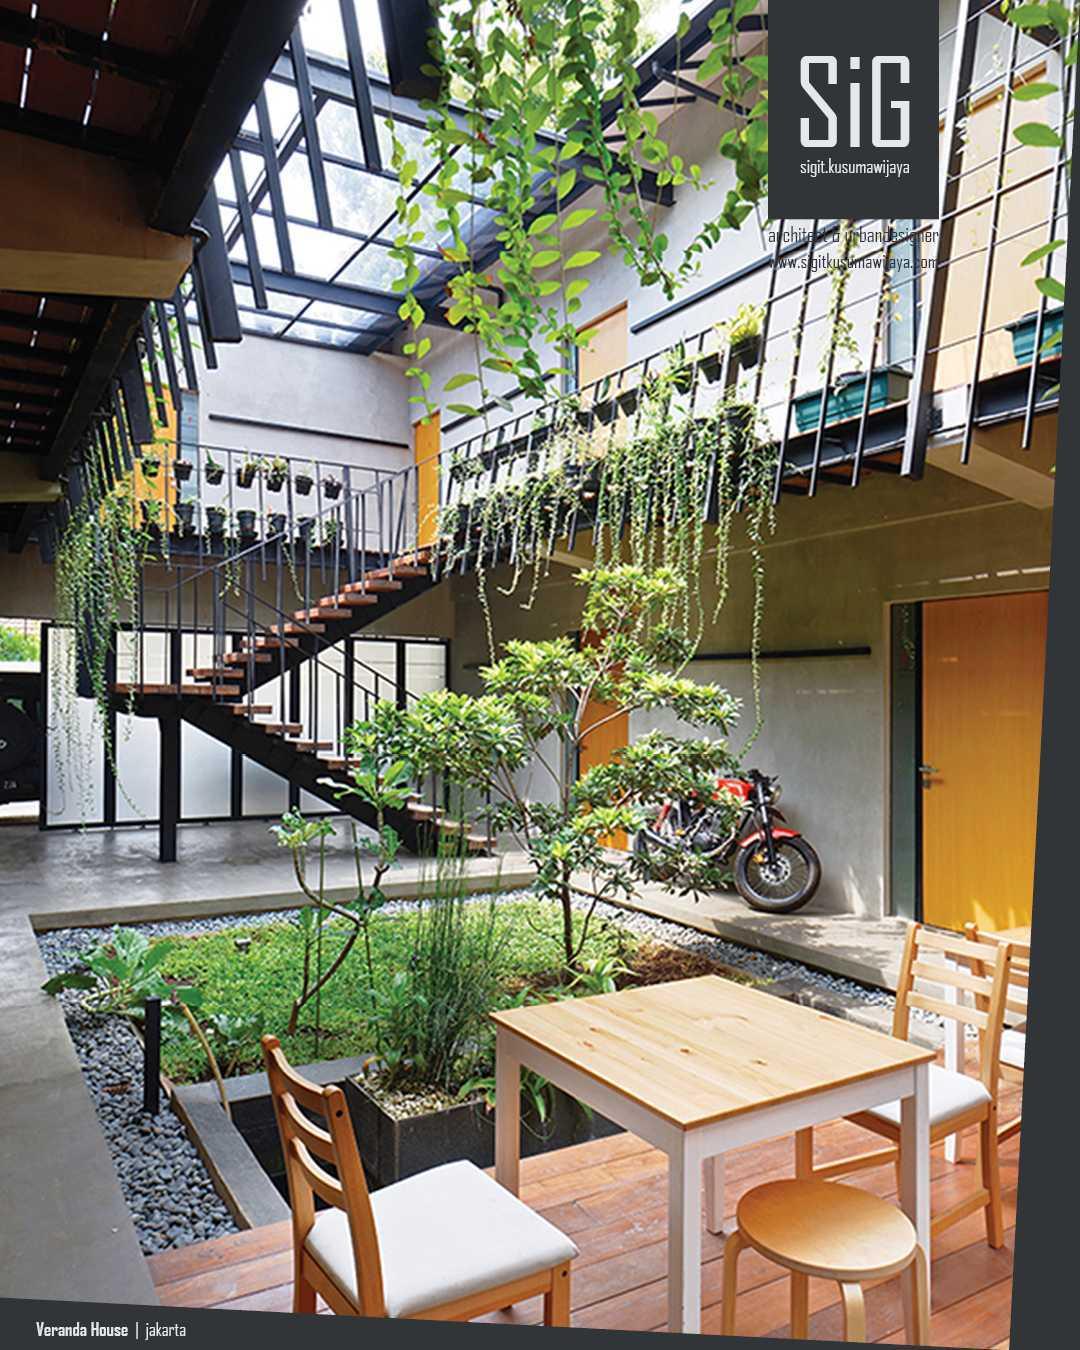 Sigit.kusumawijaya | Architect & Urbandesigner Rumah Beranda - Green Boarding House Cipete, South Jakarta, Indonesia Cipete, South Jakarta, Indonesia Sigitkusumawijaya-Architect-Urbandesigner-Rumah-Beranda-Green-Boarding-House Tropis 55011